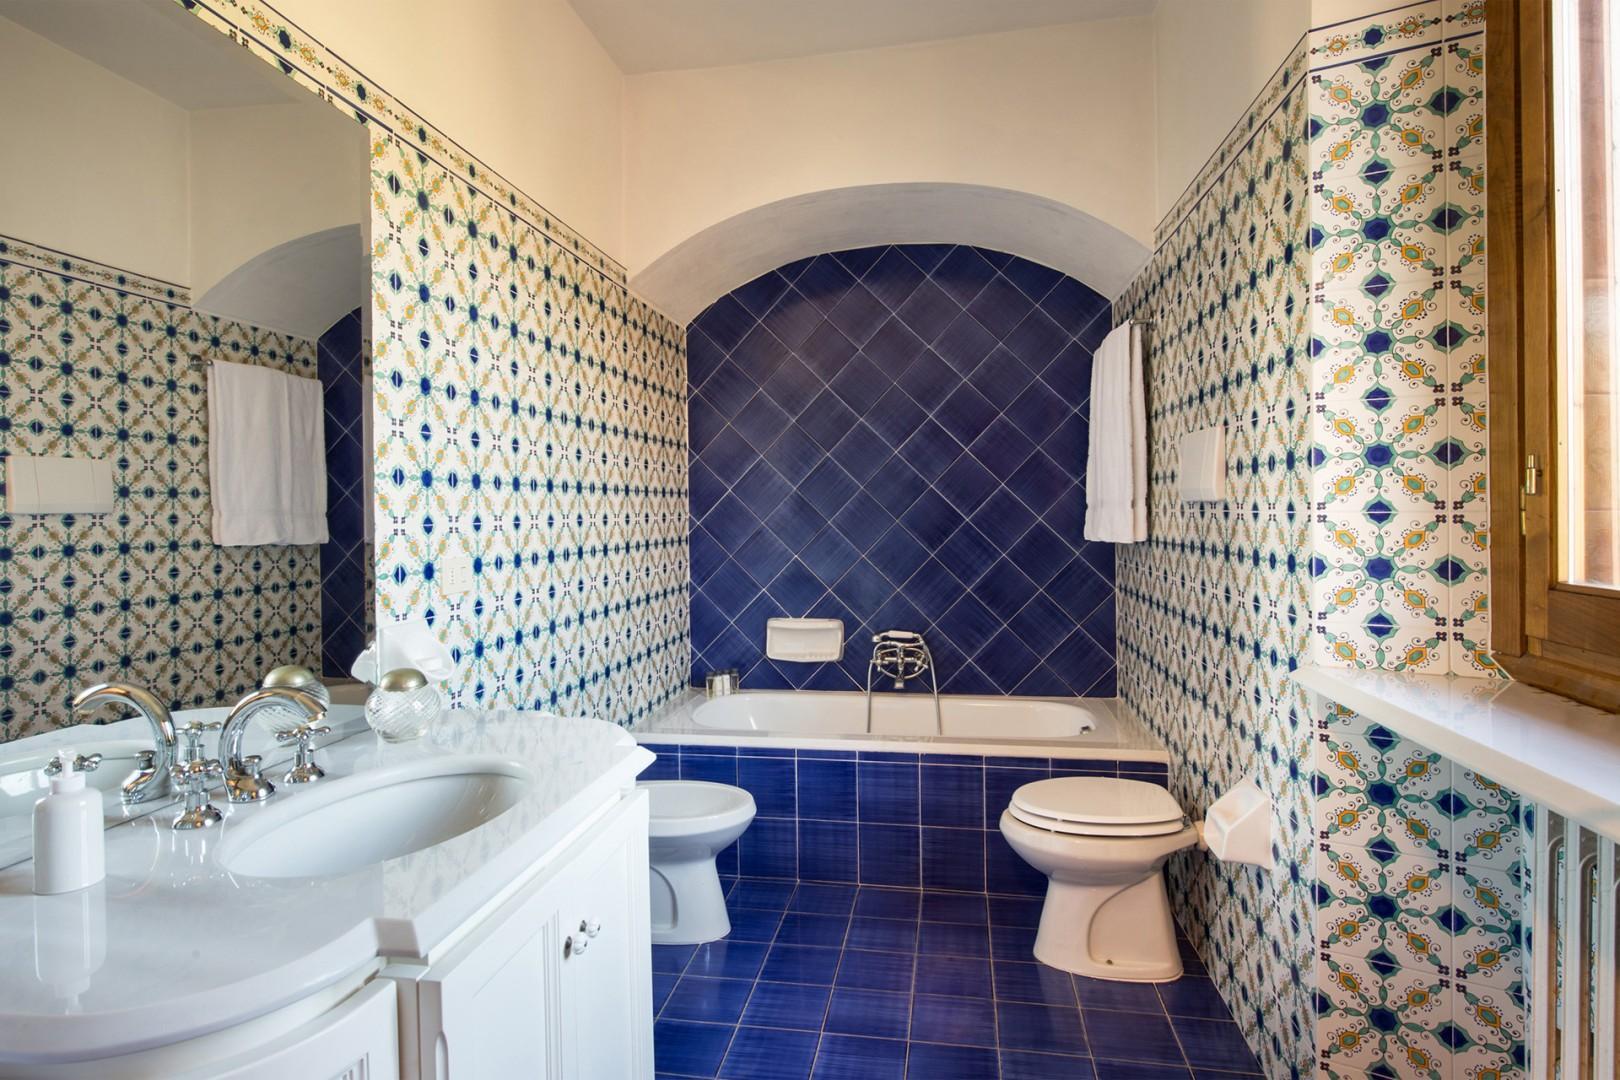 Beautiful bathroom 2 with bathtub, sink, toilet and bidet.